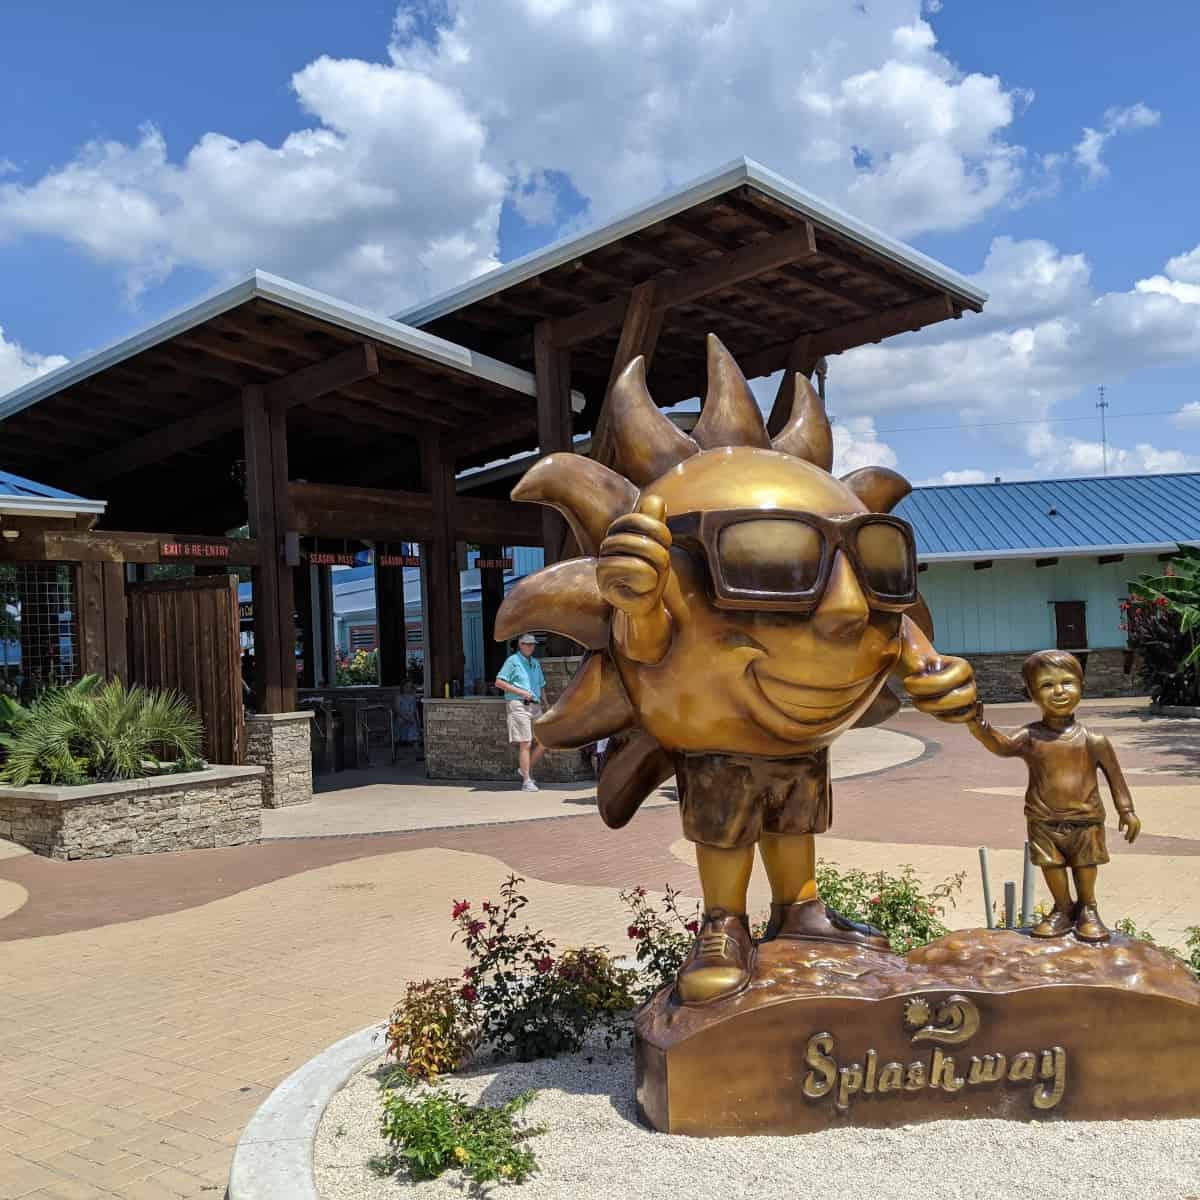 Splashway Waterpark Statue